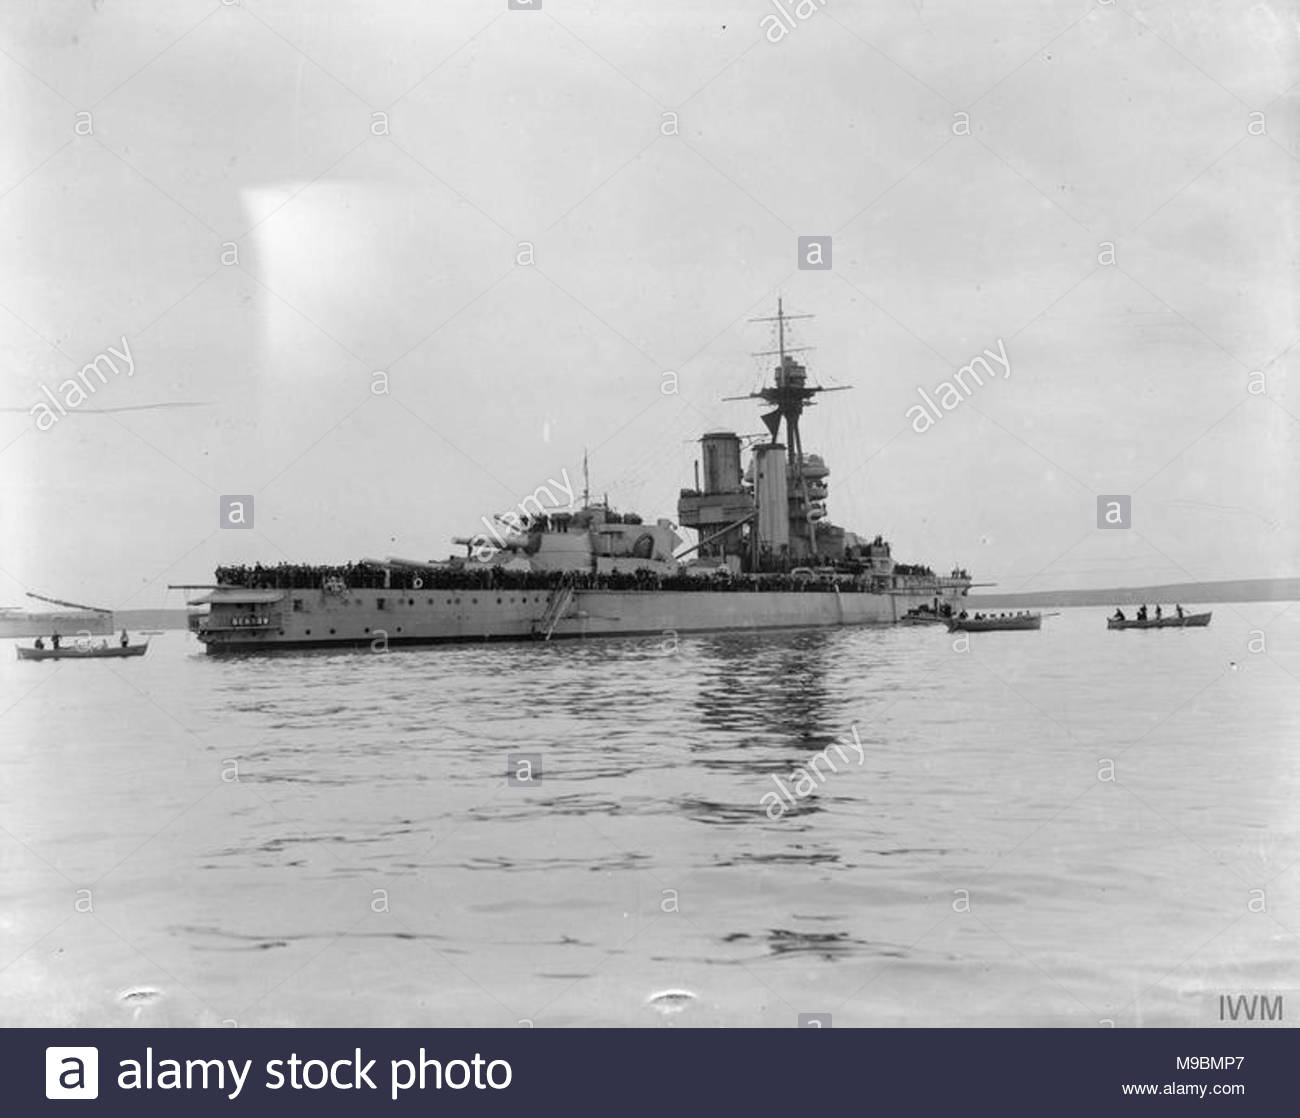 Battleship HMS Benbow, World War I 9